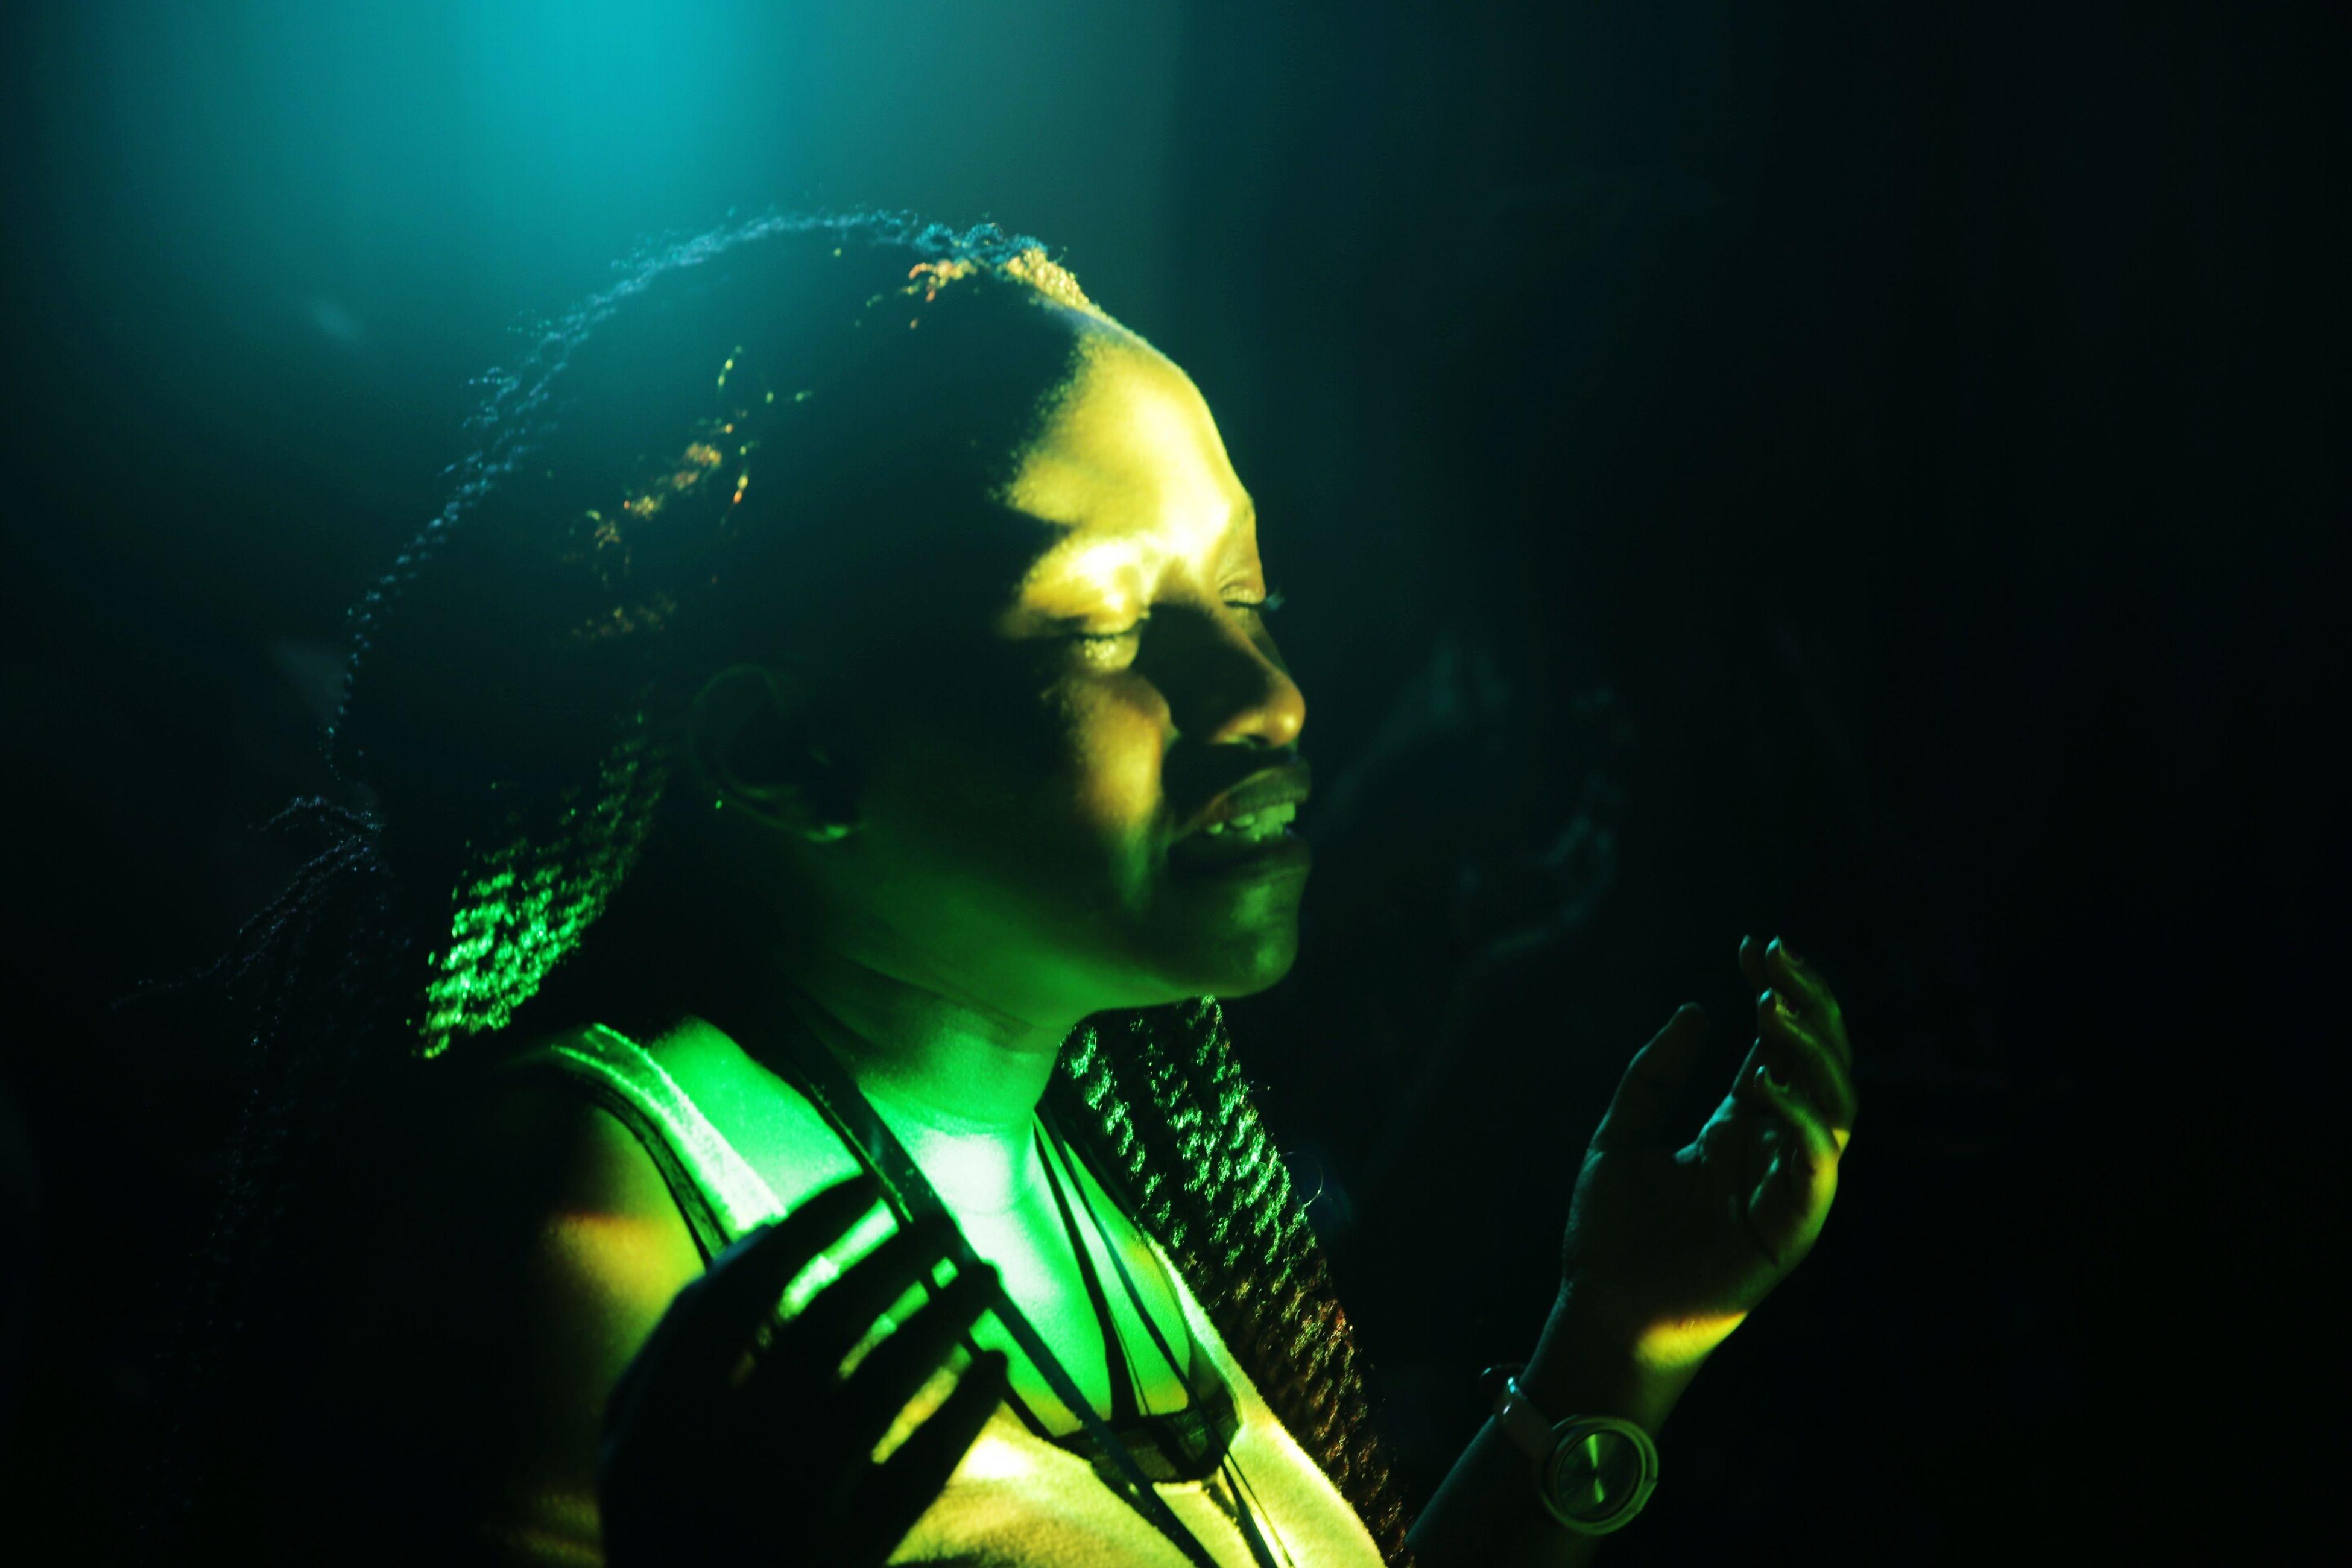 headshot, auto post production filter, black background, green color, studio shot, sunbeam, dark, back lit, long hair, person, multi colored, vibrant color